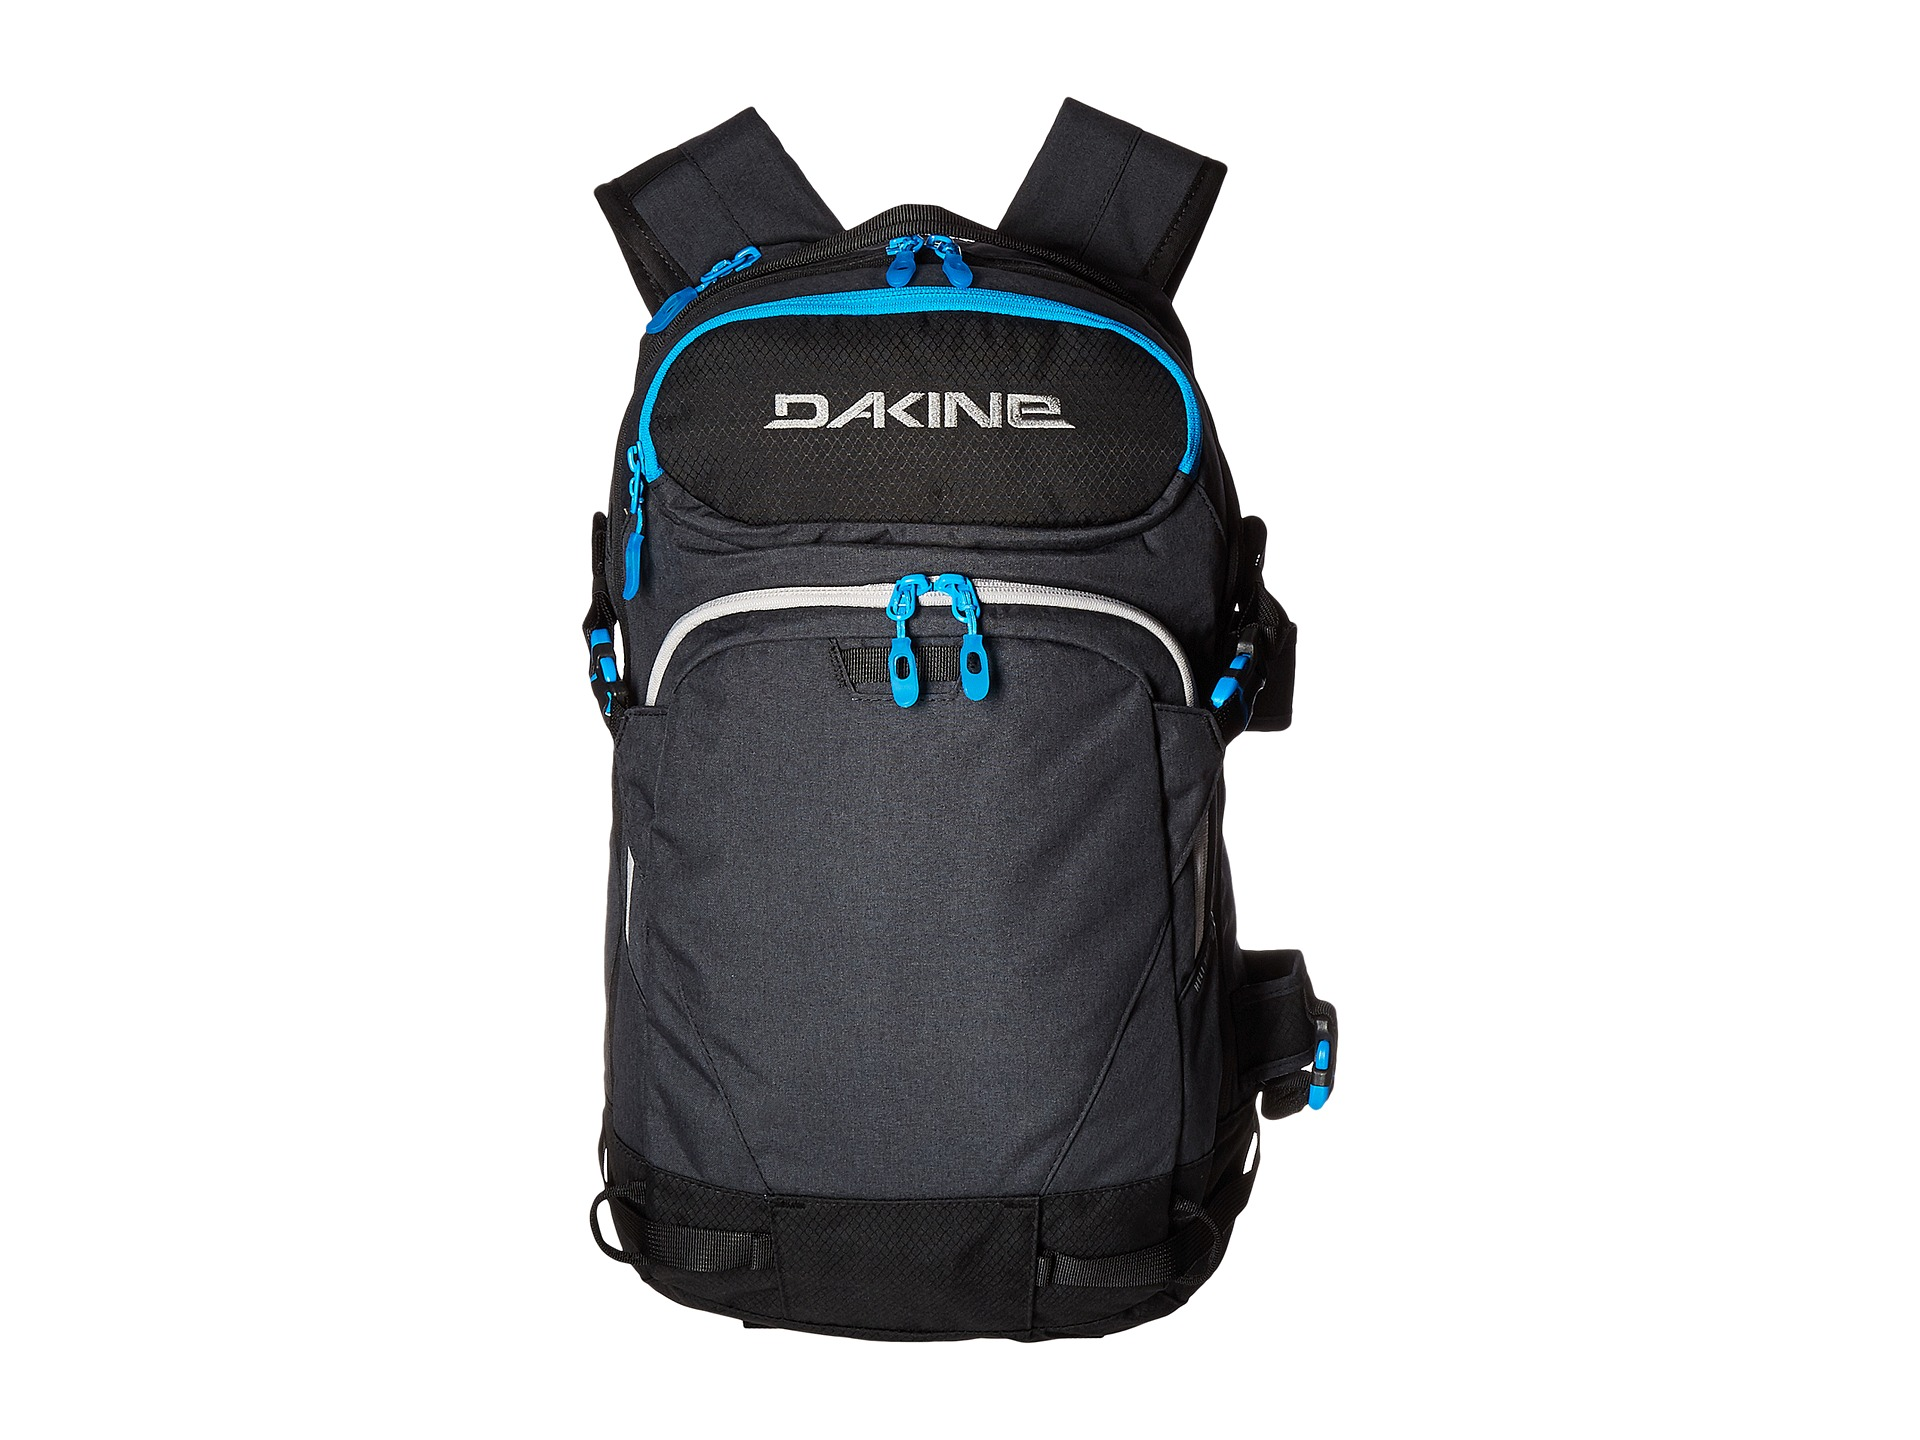 Dakine Heli Pro 20L - Zappos.com Free Shipping BOTH Ways